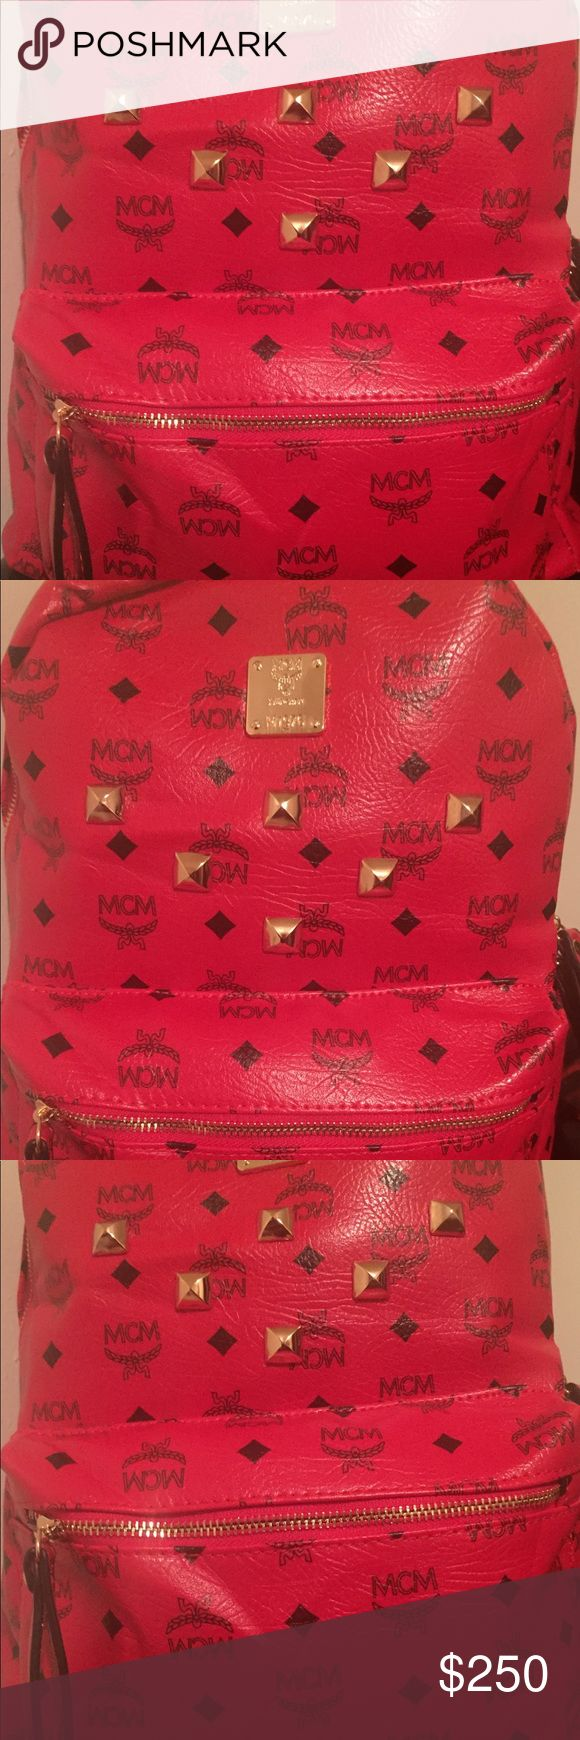 Mcm backpack Great bag like new MCM Bags Backpacks